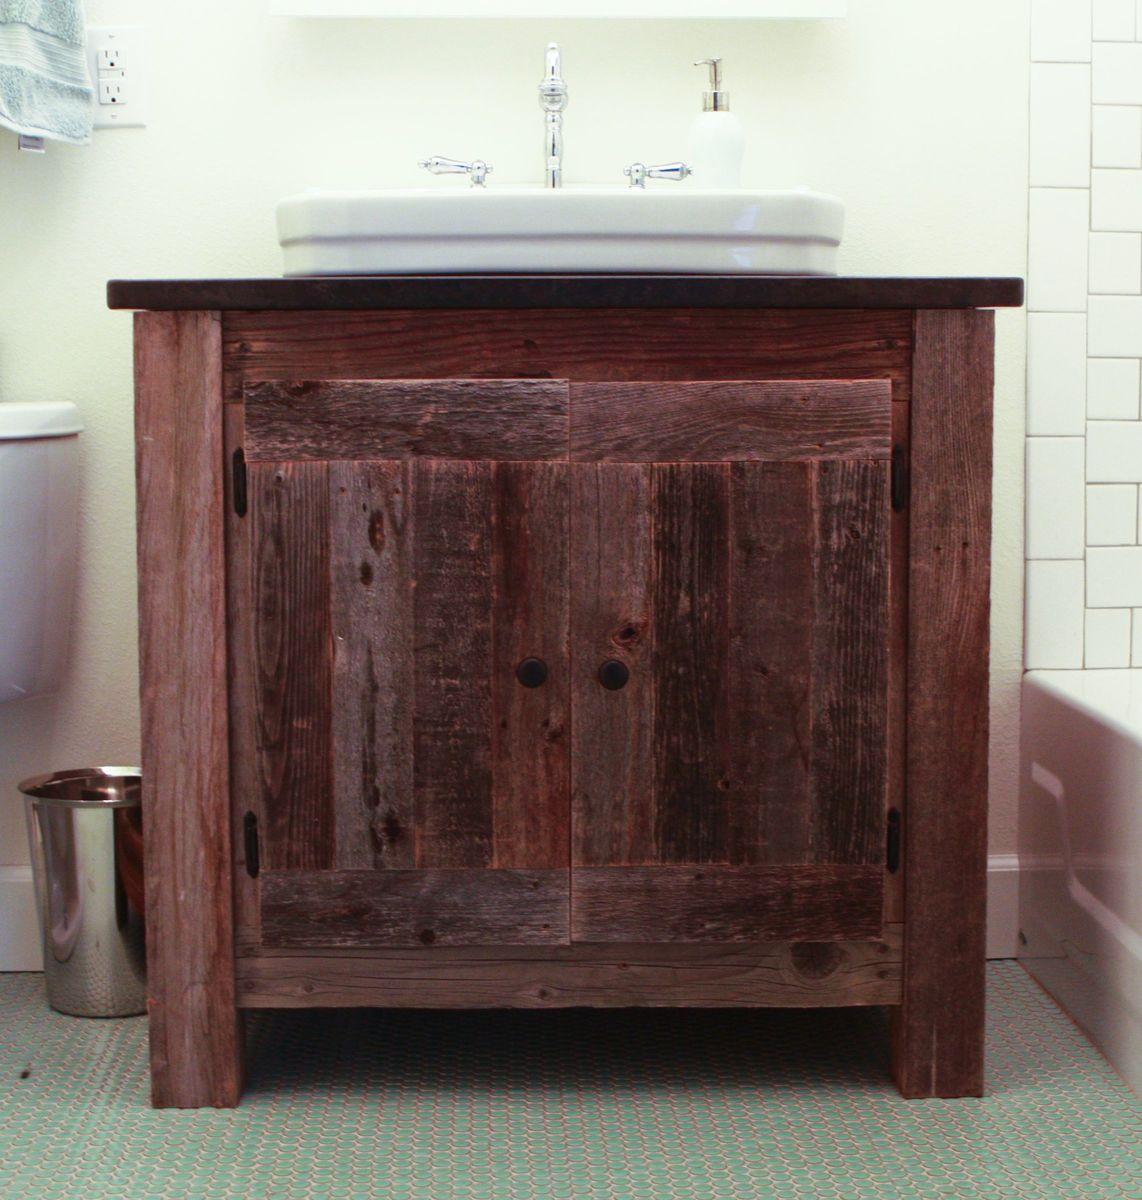 Ana White  Reclaimed Wood Farmhouse Vanity  DIY Projects